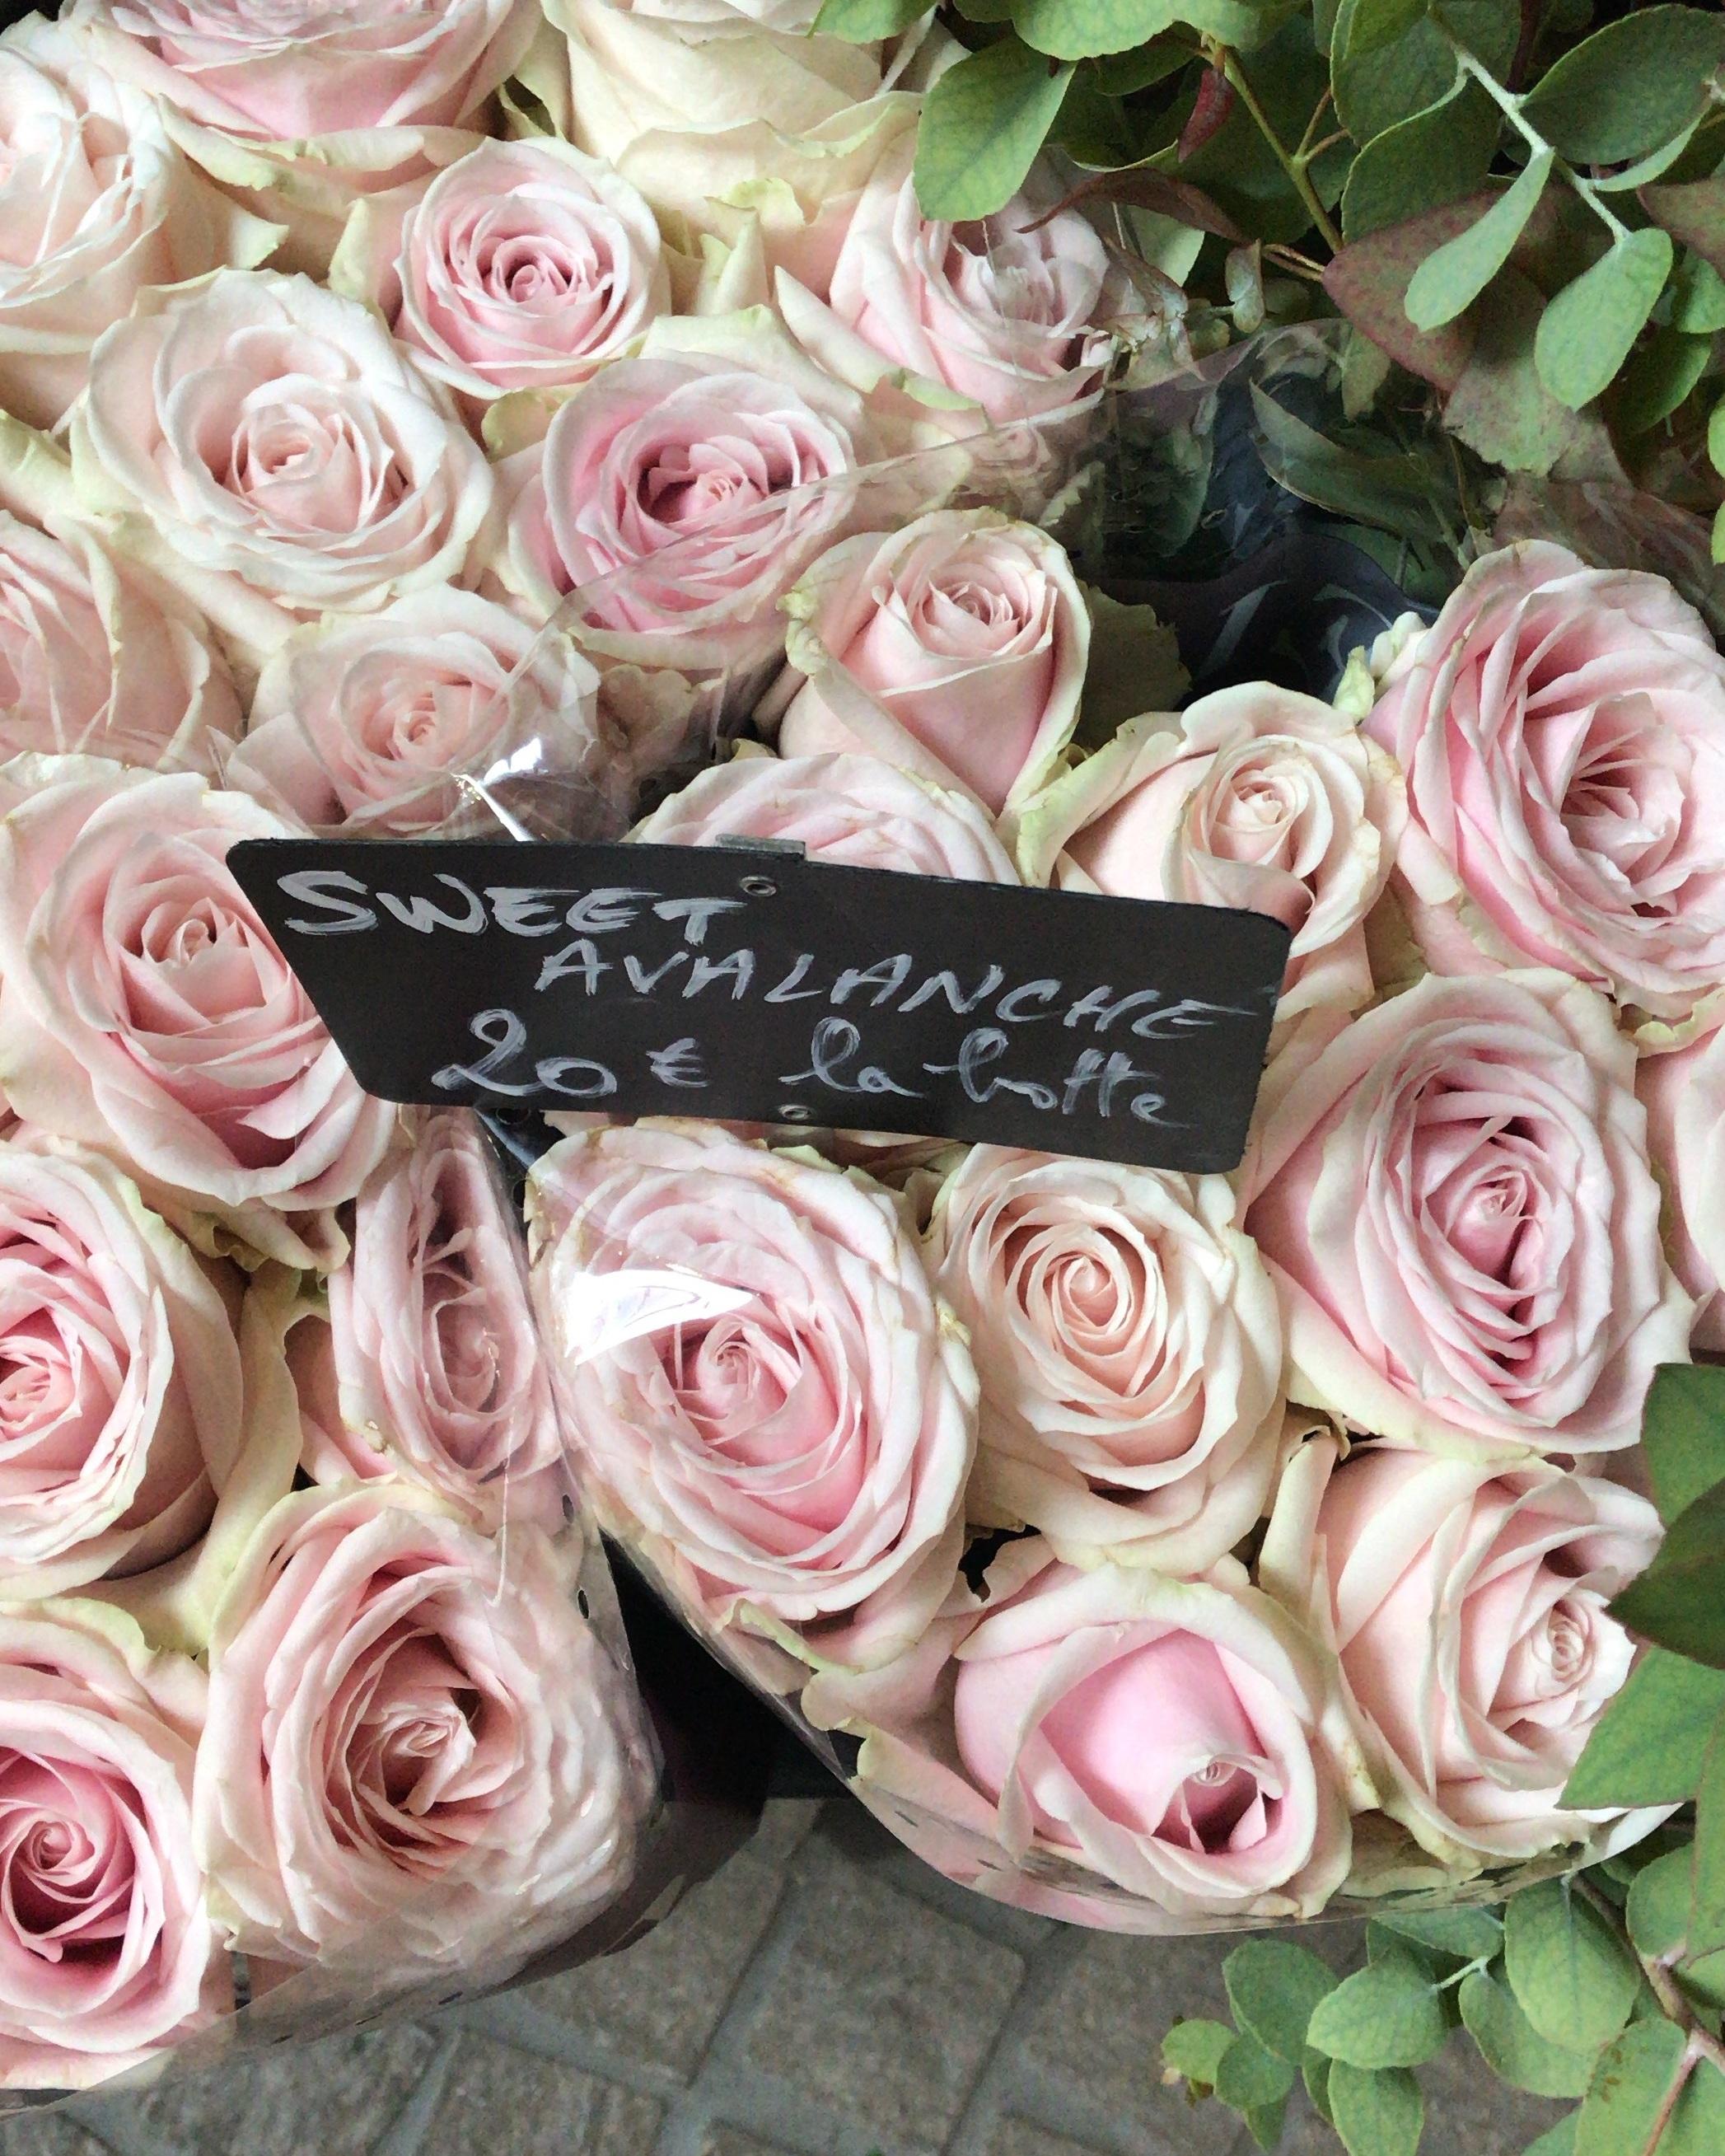 paris-flower-market-pink-roses.jpg